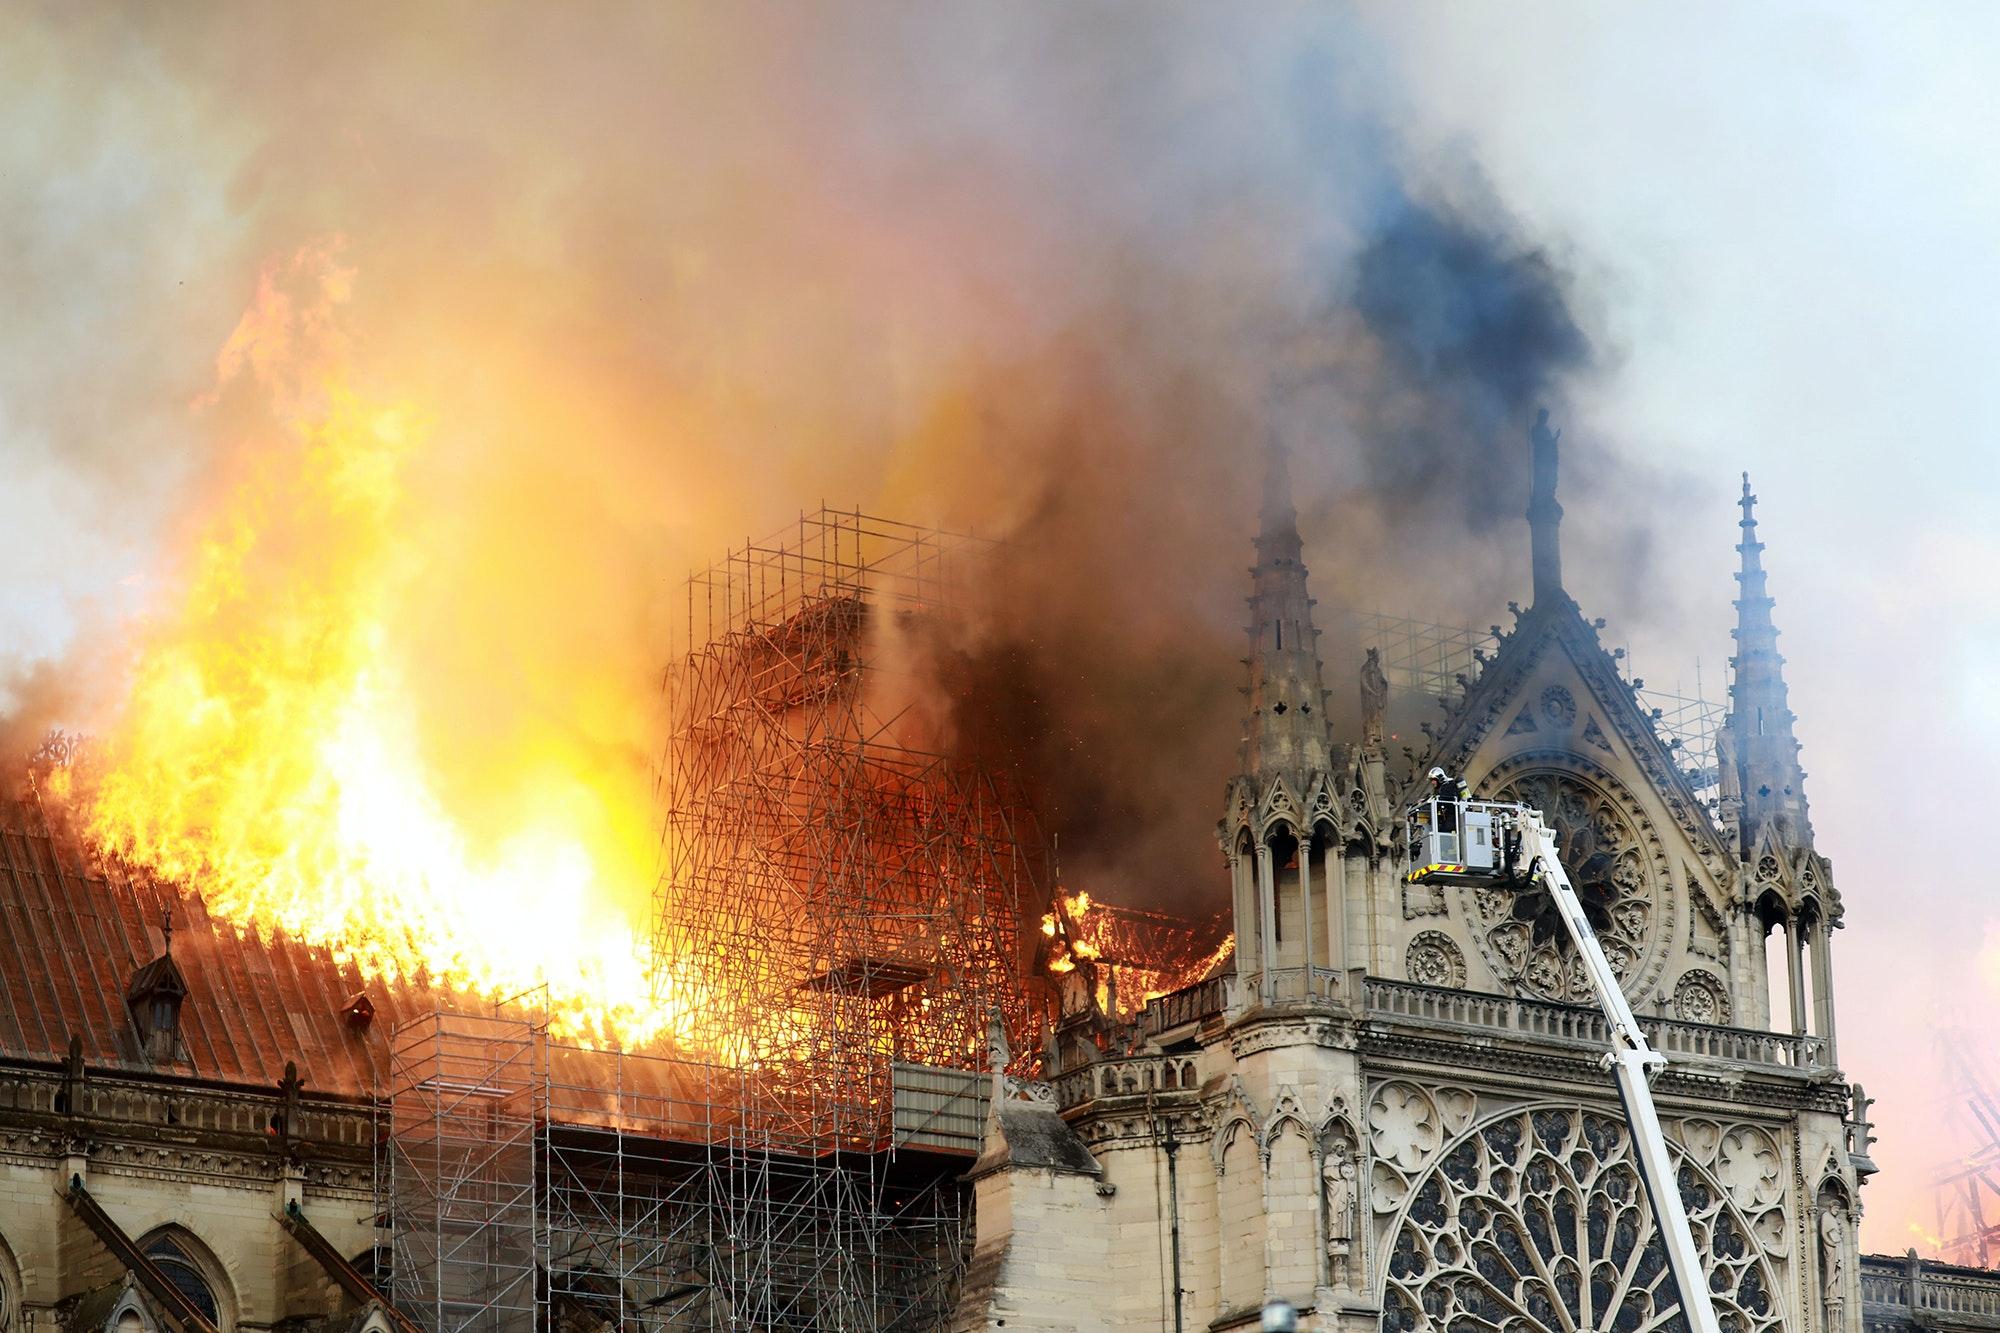 Firefights battling the blaze yesterday as it spread across the roof of Cathédrale Notre Dame de Paris